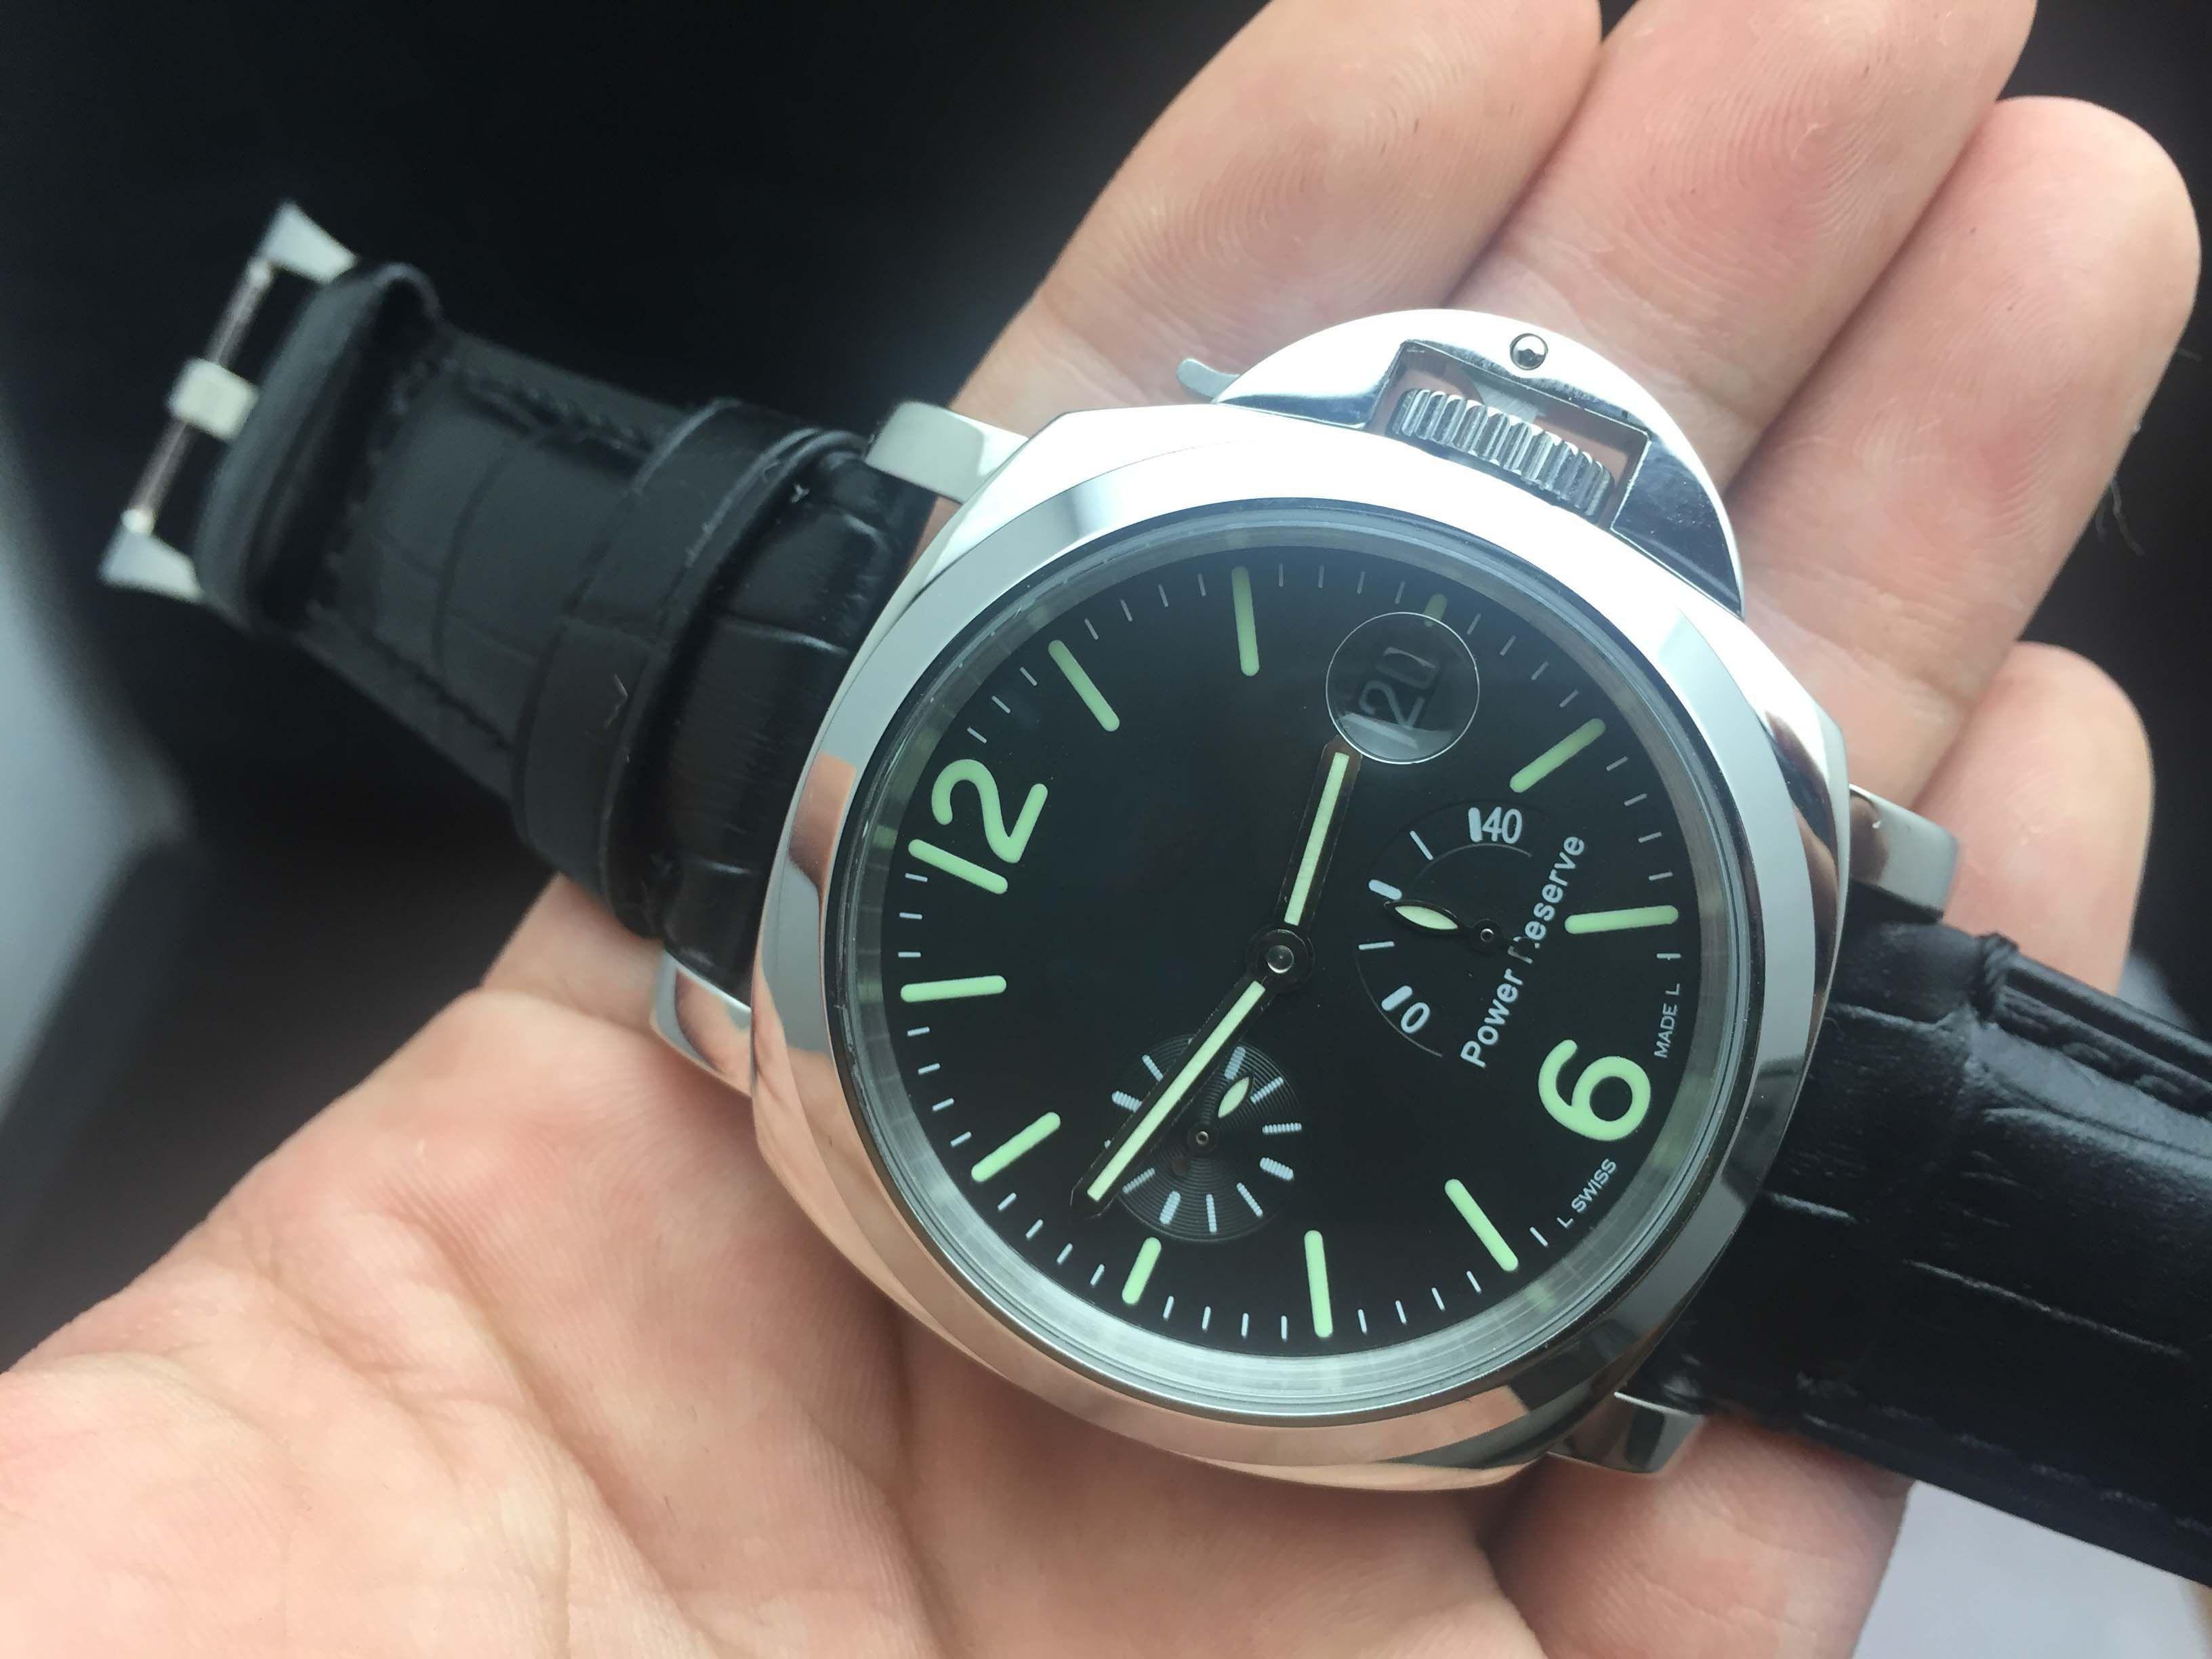 luxury watch high quality mens watches 44mm black dial power luxury watch high quality mens watches 44mm black dial power storage automatic wristwatch luminous watch waterproof